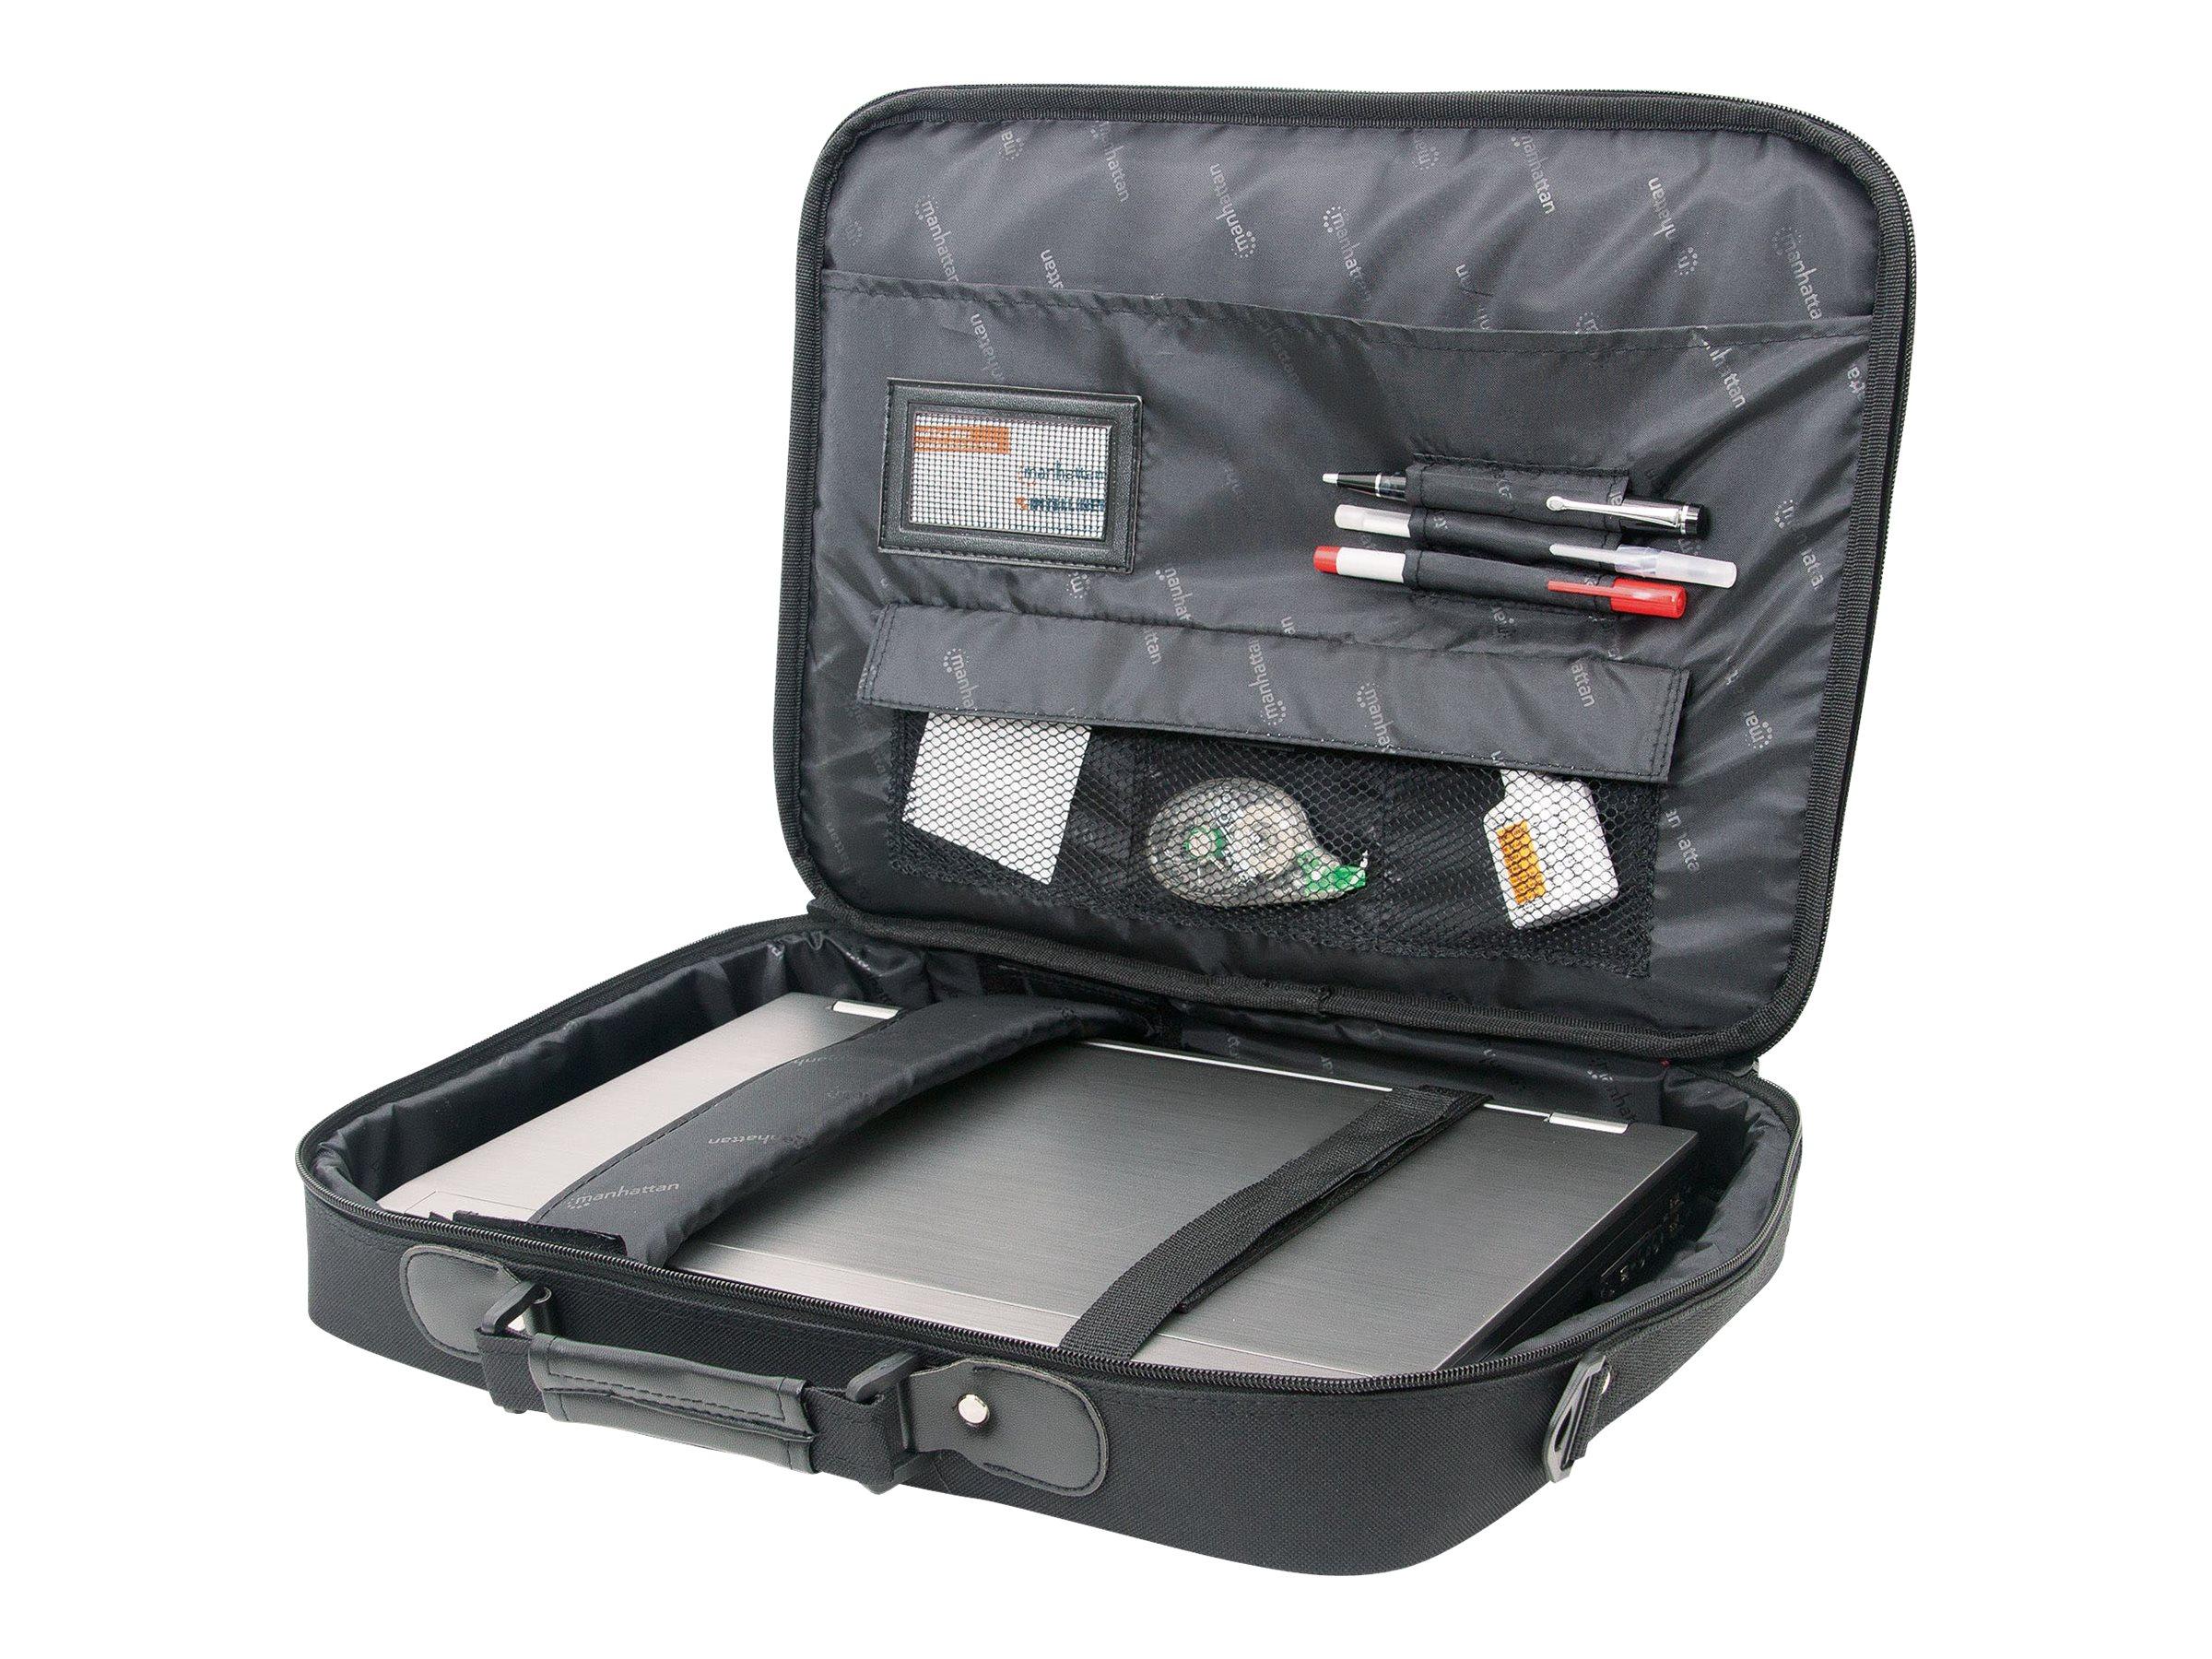 "Manhattan Empire Laptop Bag 17.3"", Clamshell design, Accessories Pocket, Shoulder Strap (removable)"